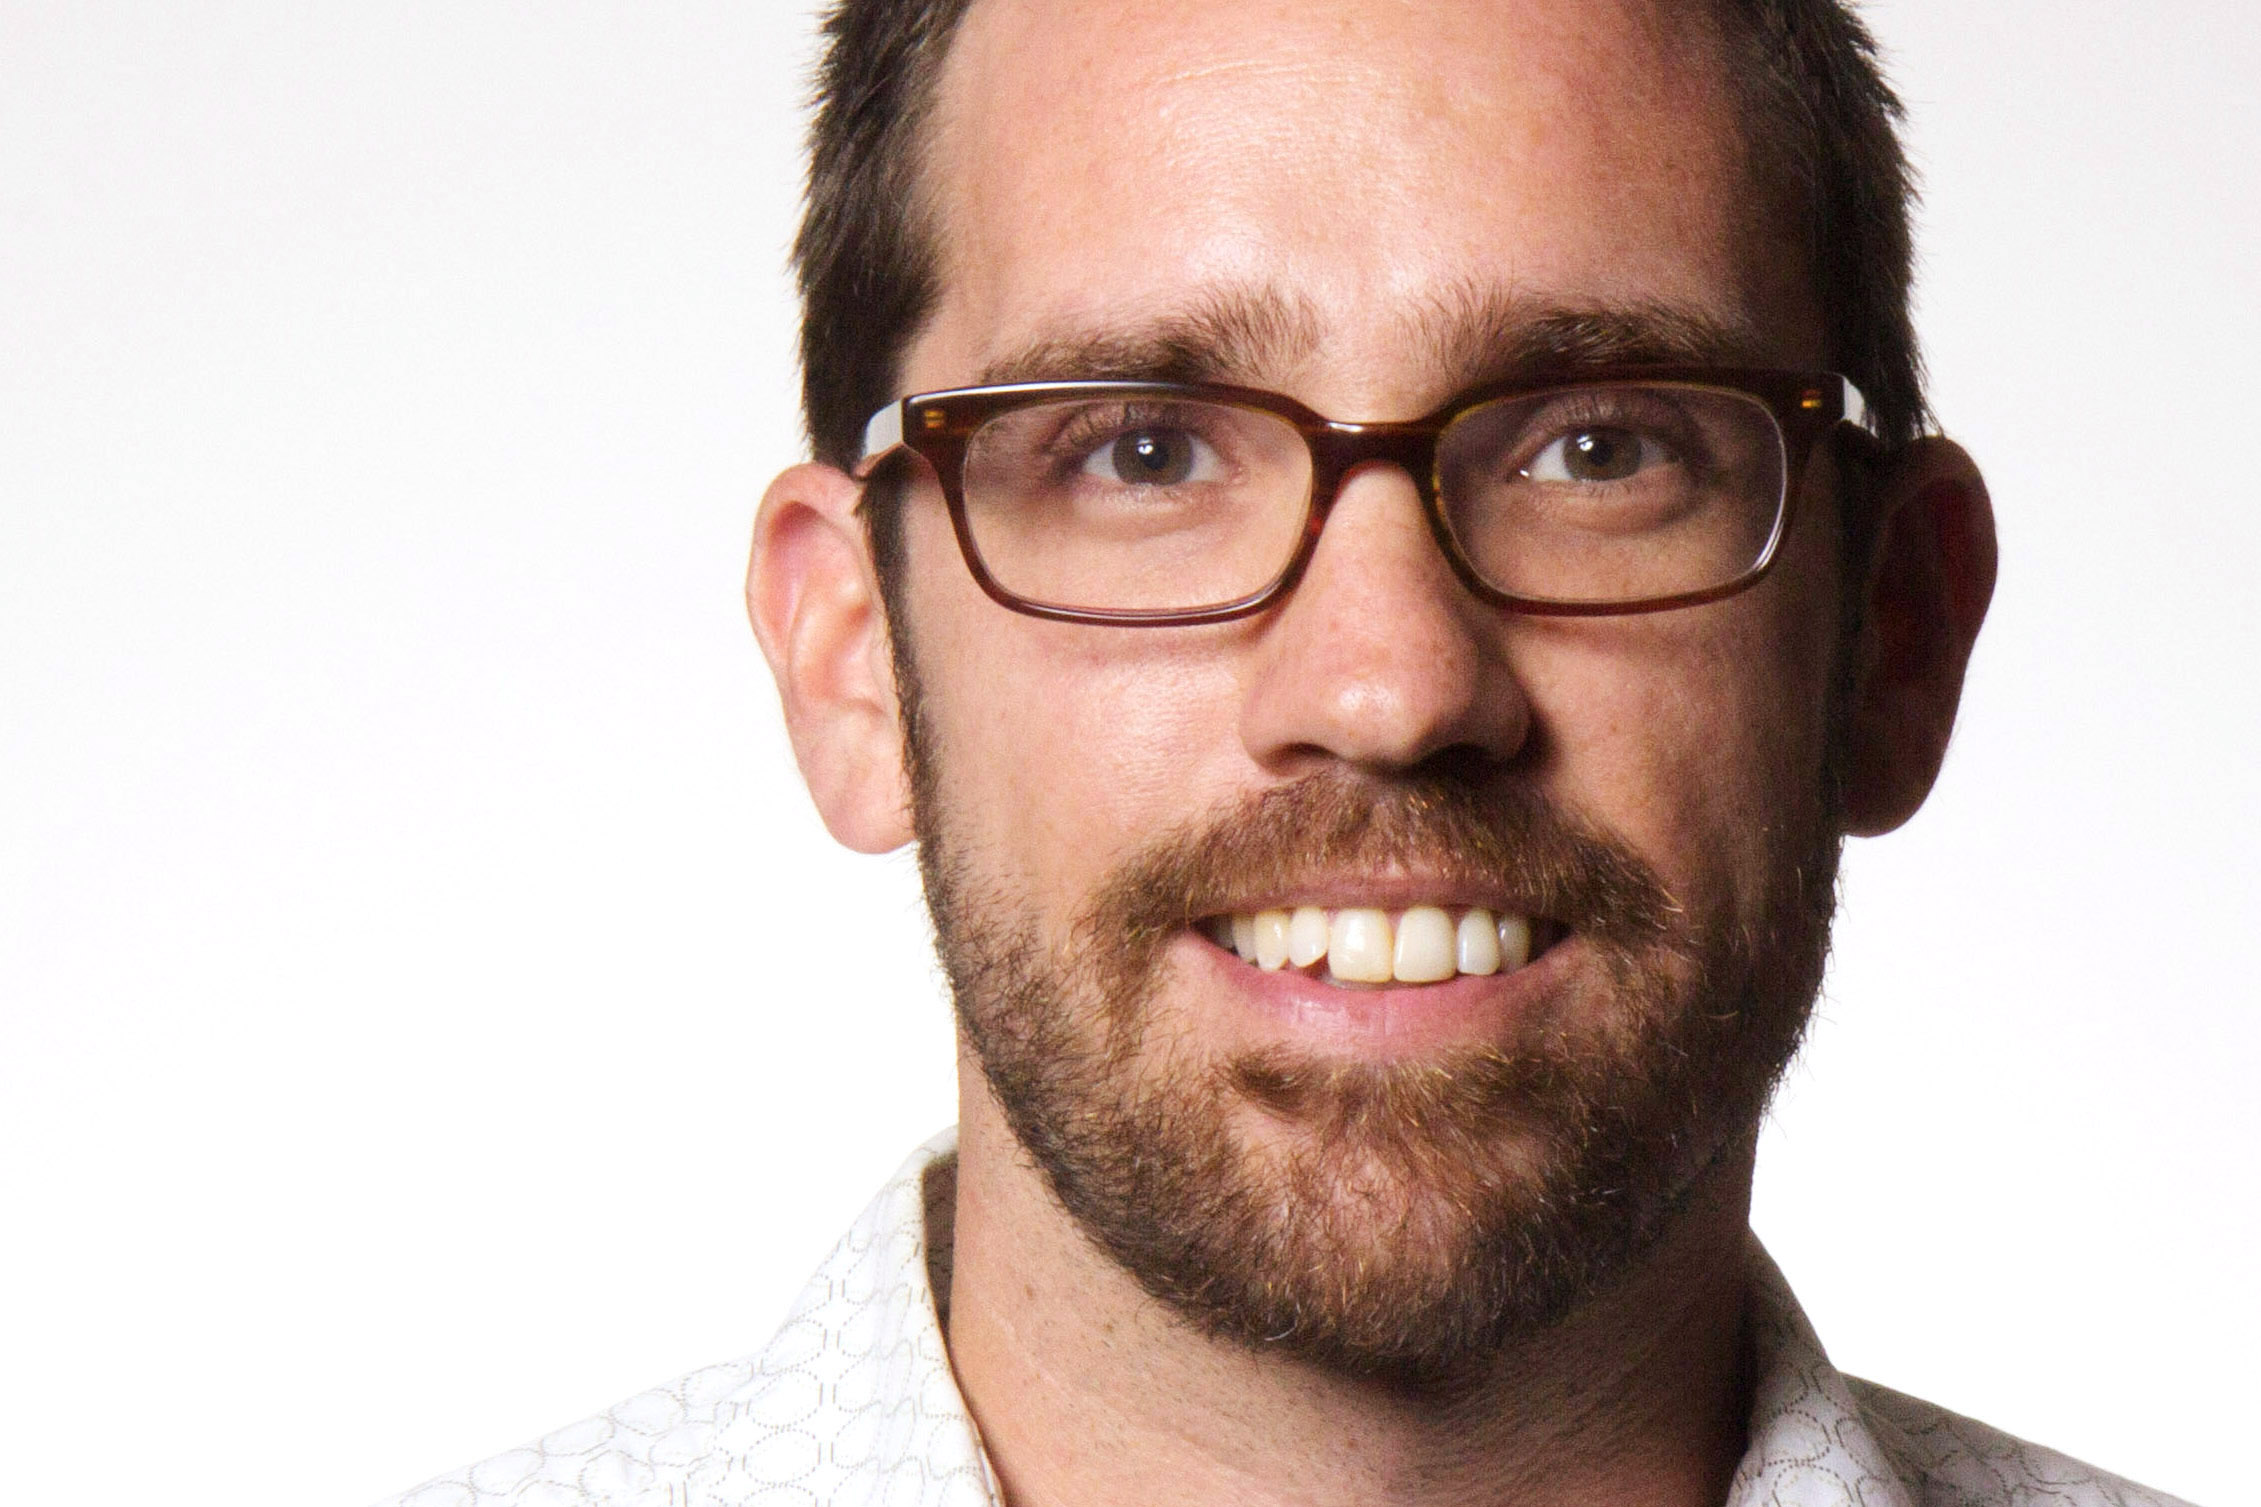 Zach Putnam